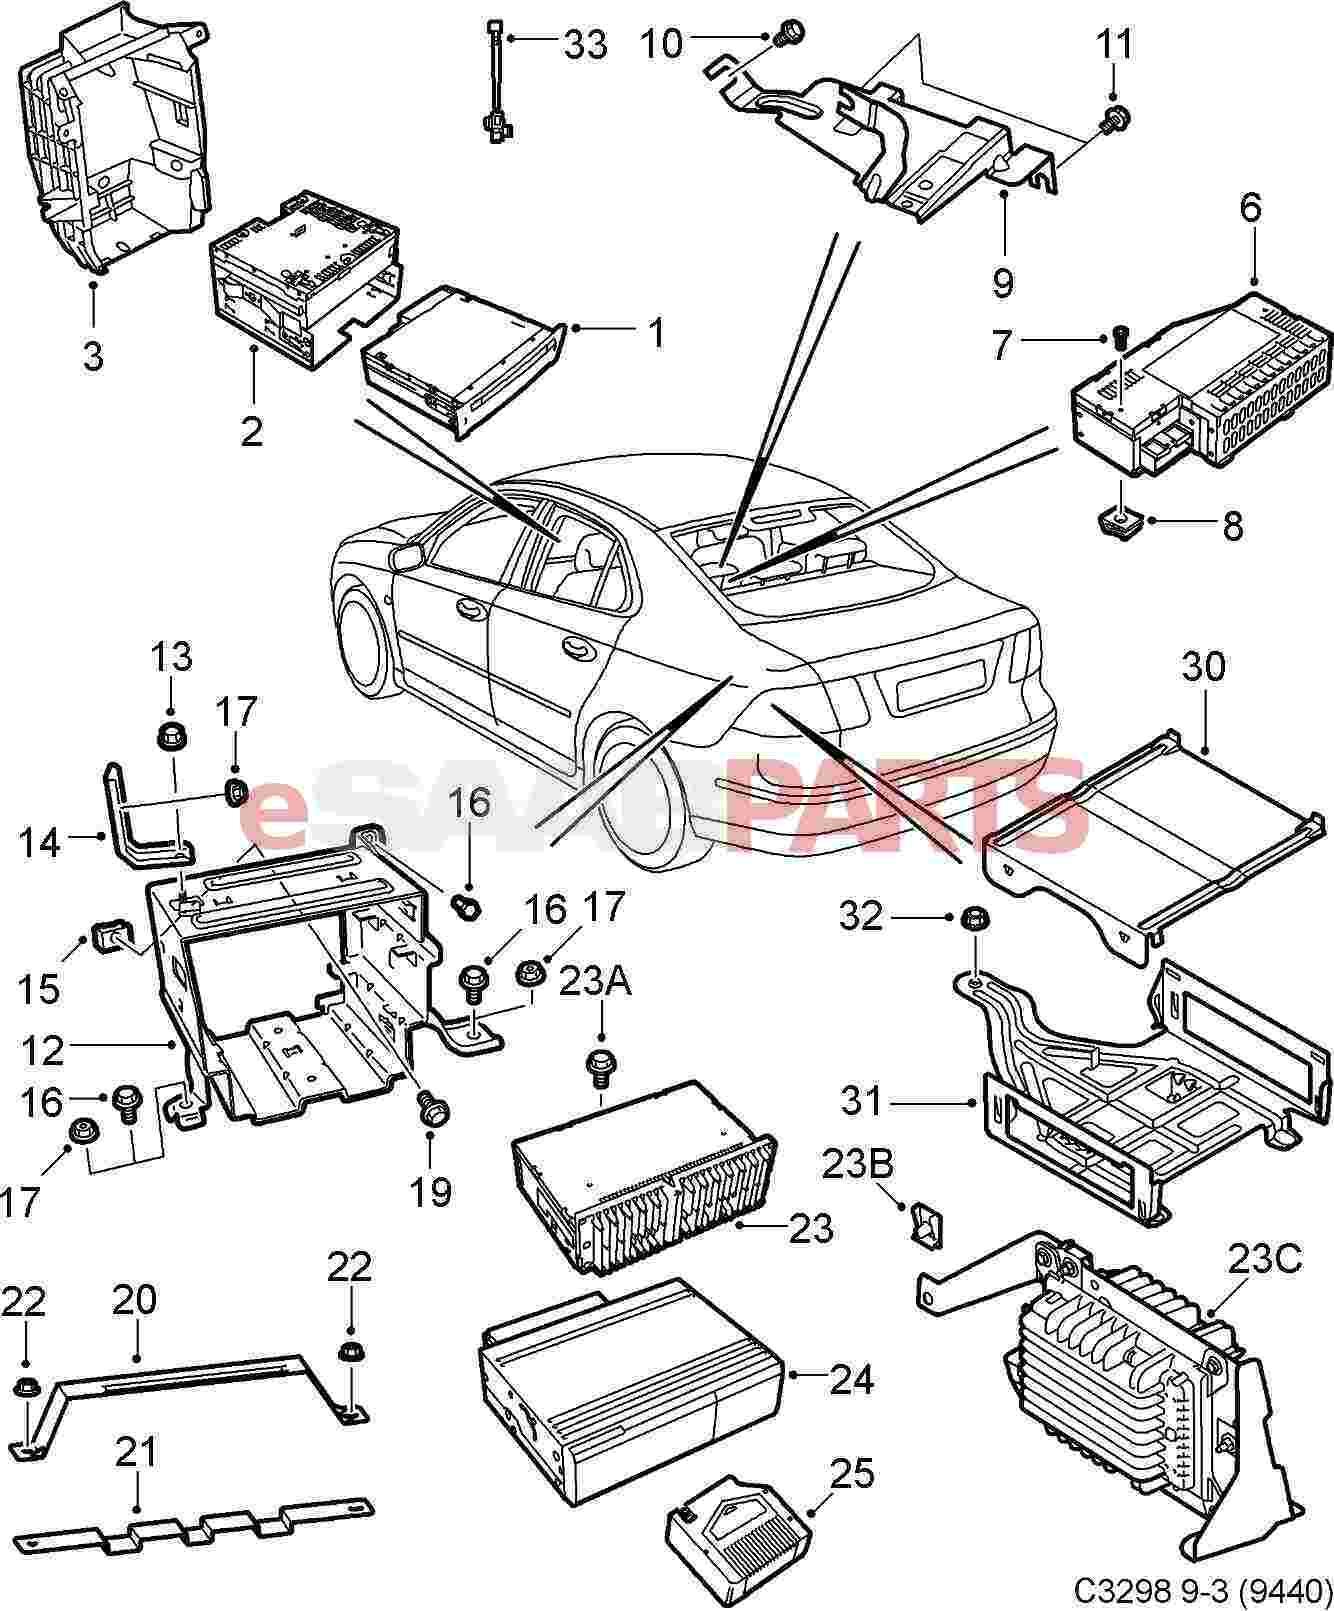 bazooka bta850fh wiring diagram jungle animal food web 2004 saab 9 3 amp2 33